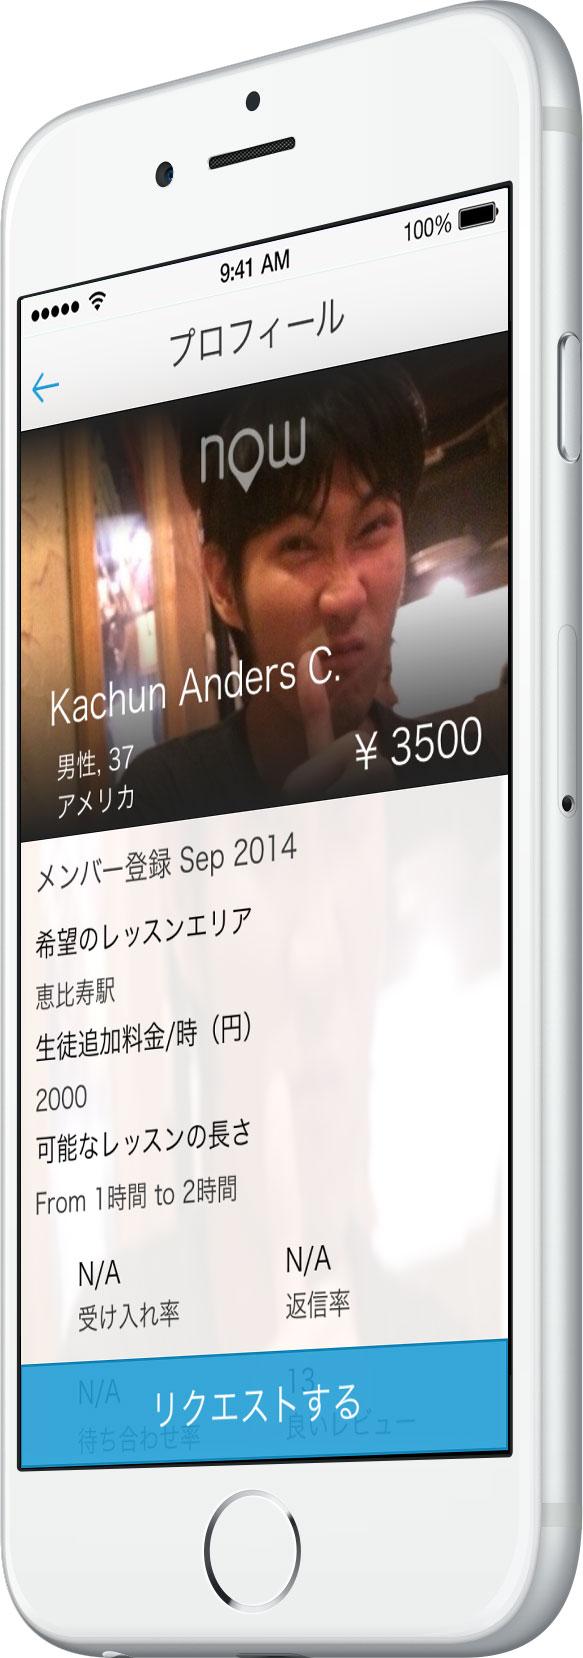 teacher_Kachun.jpg